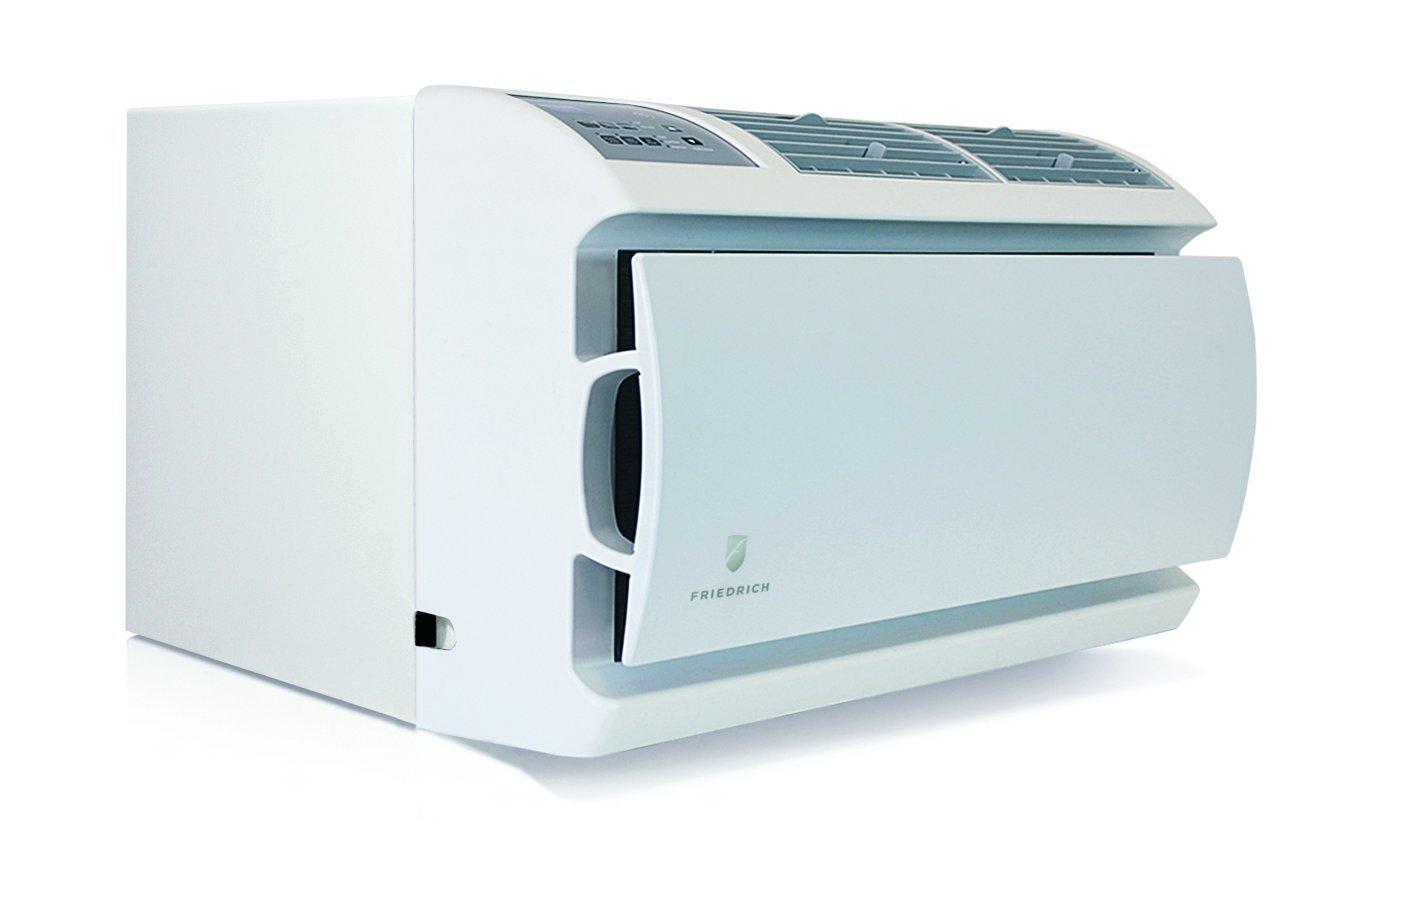 Friedrich Ws15d30 14 500 Btu Thru The Wall Air Conditioner